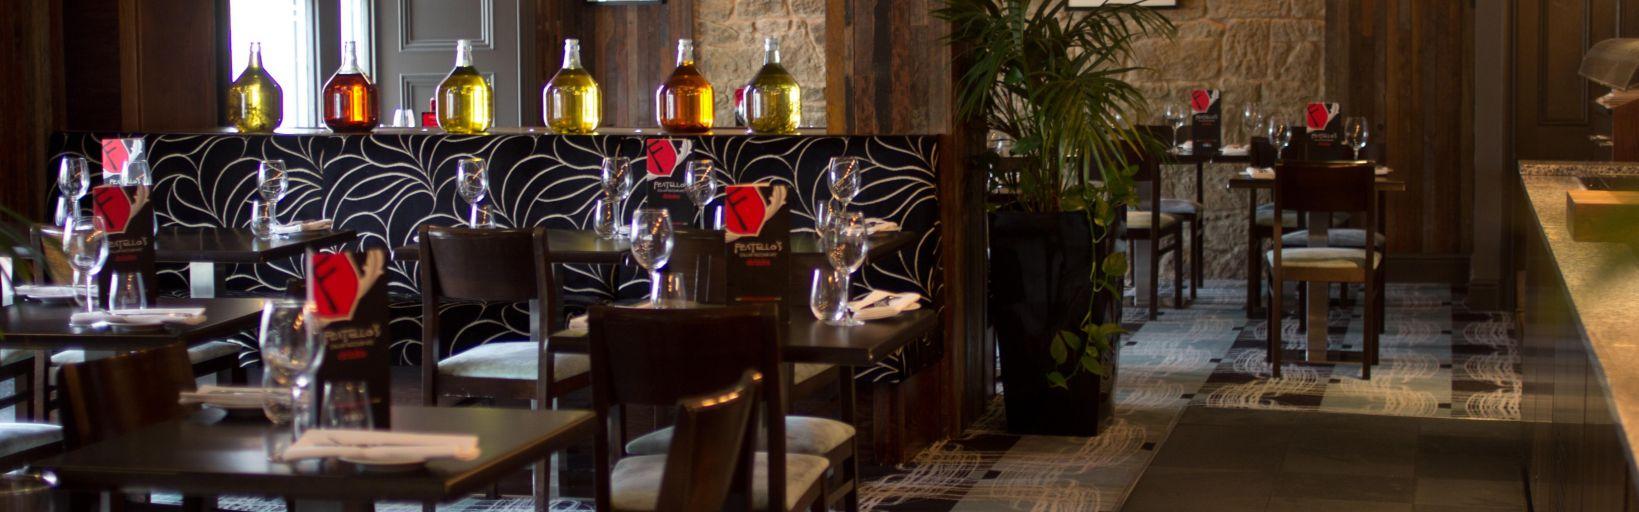 Fratello39s Italian Restaurant At The Holiday Inn Newcastle Jesmond